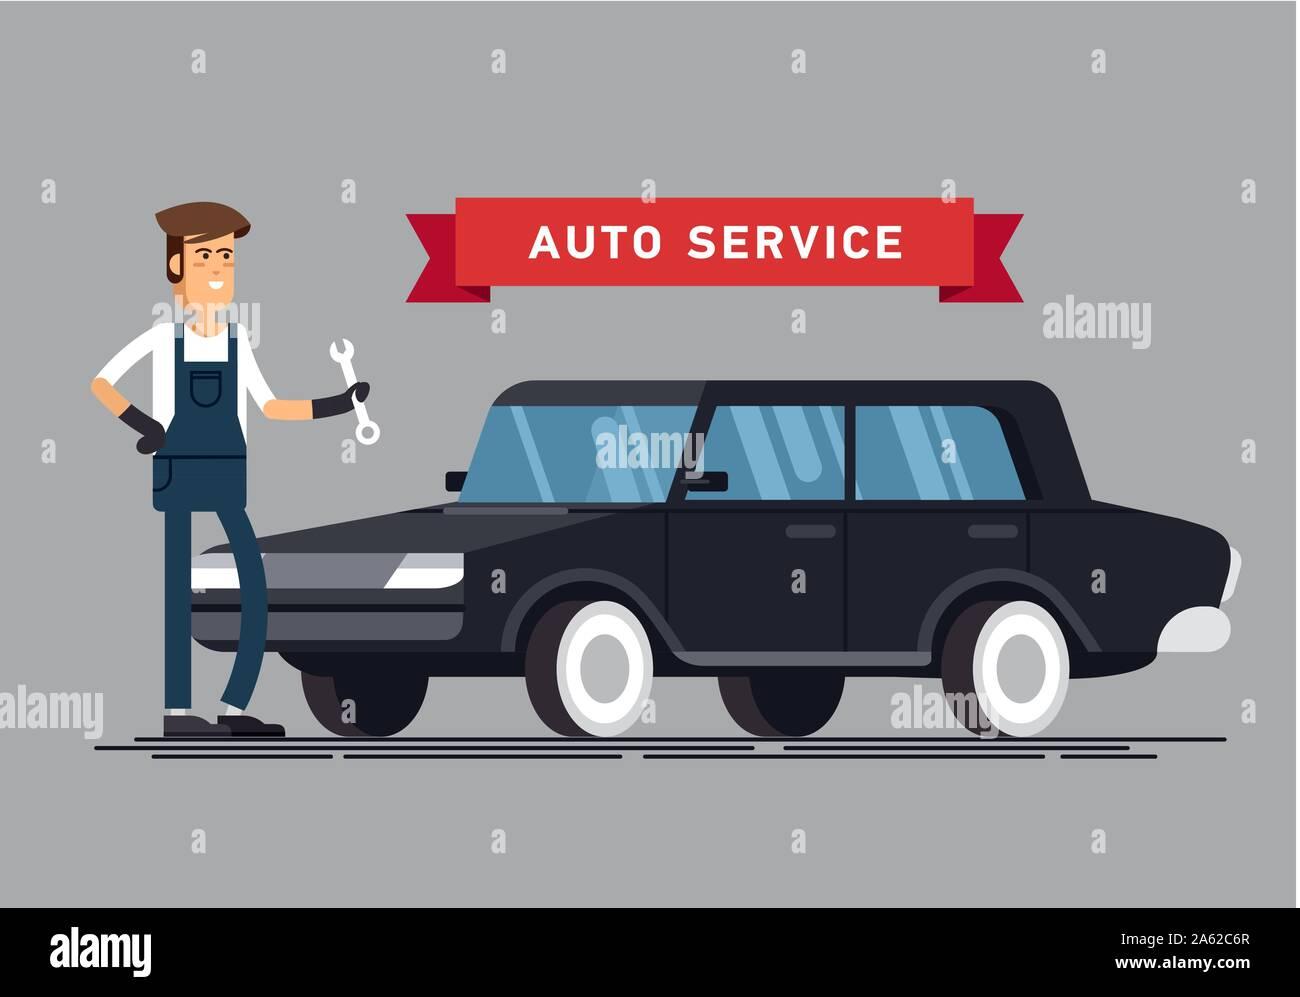 Car Repair And Maintenance >> Car Repair Shop And Auto Service Vector Illustrations